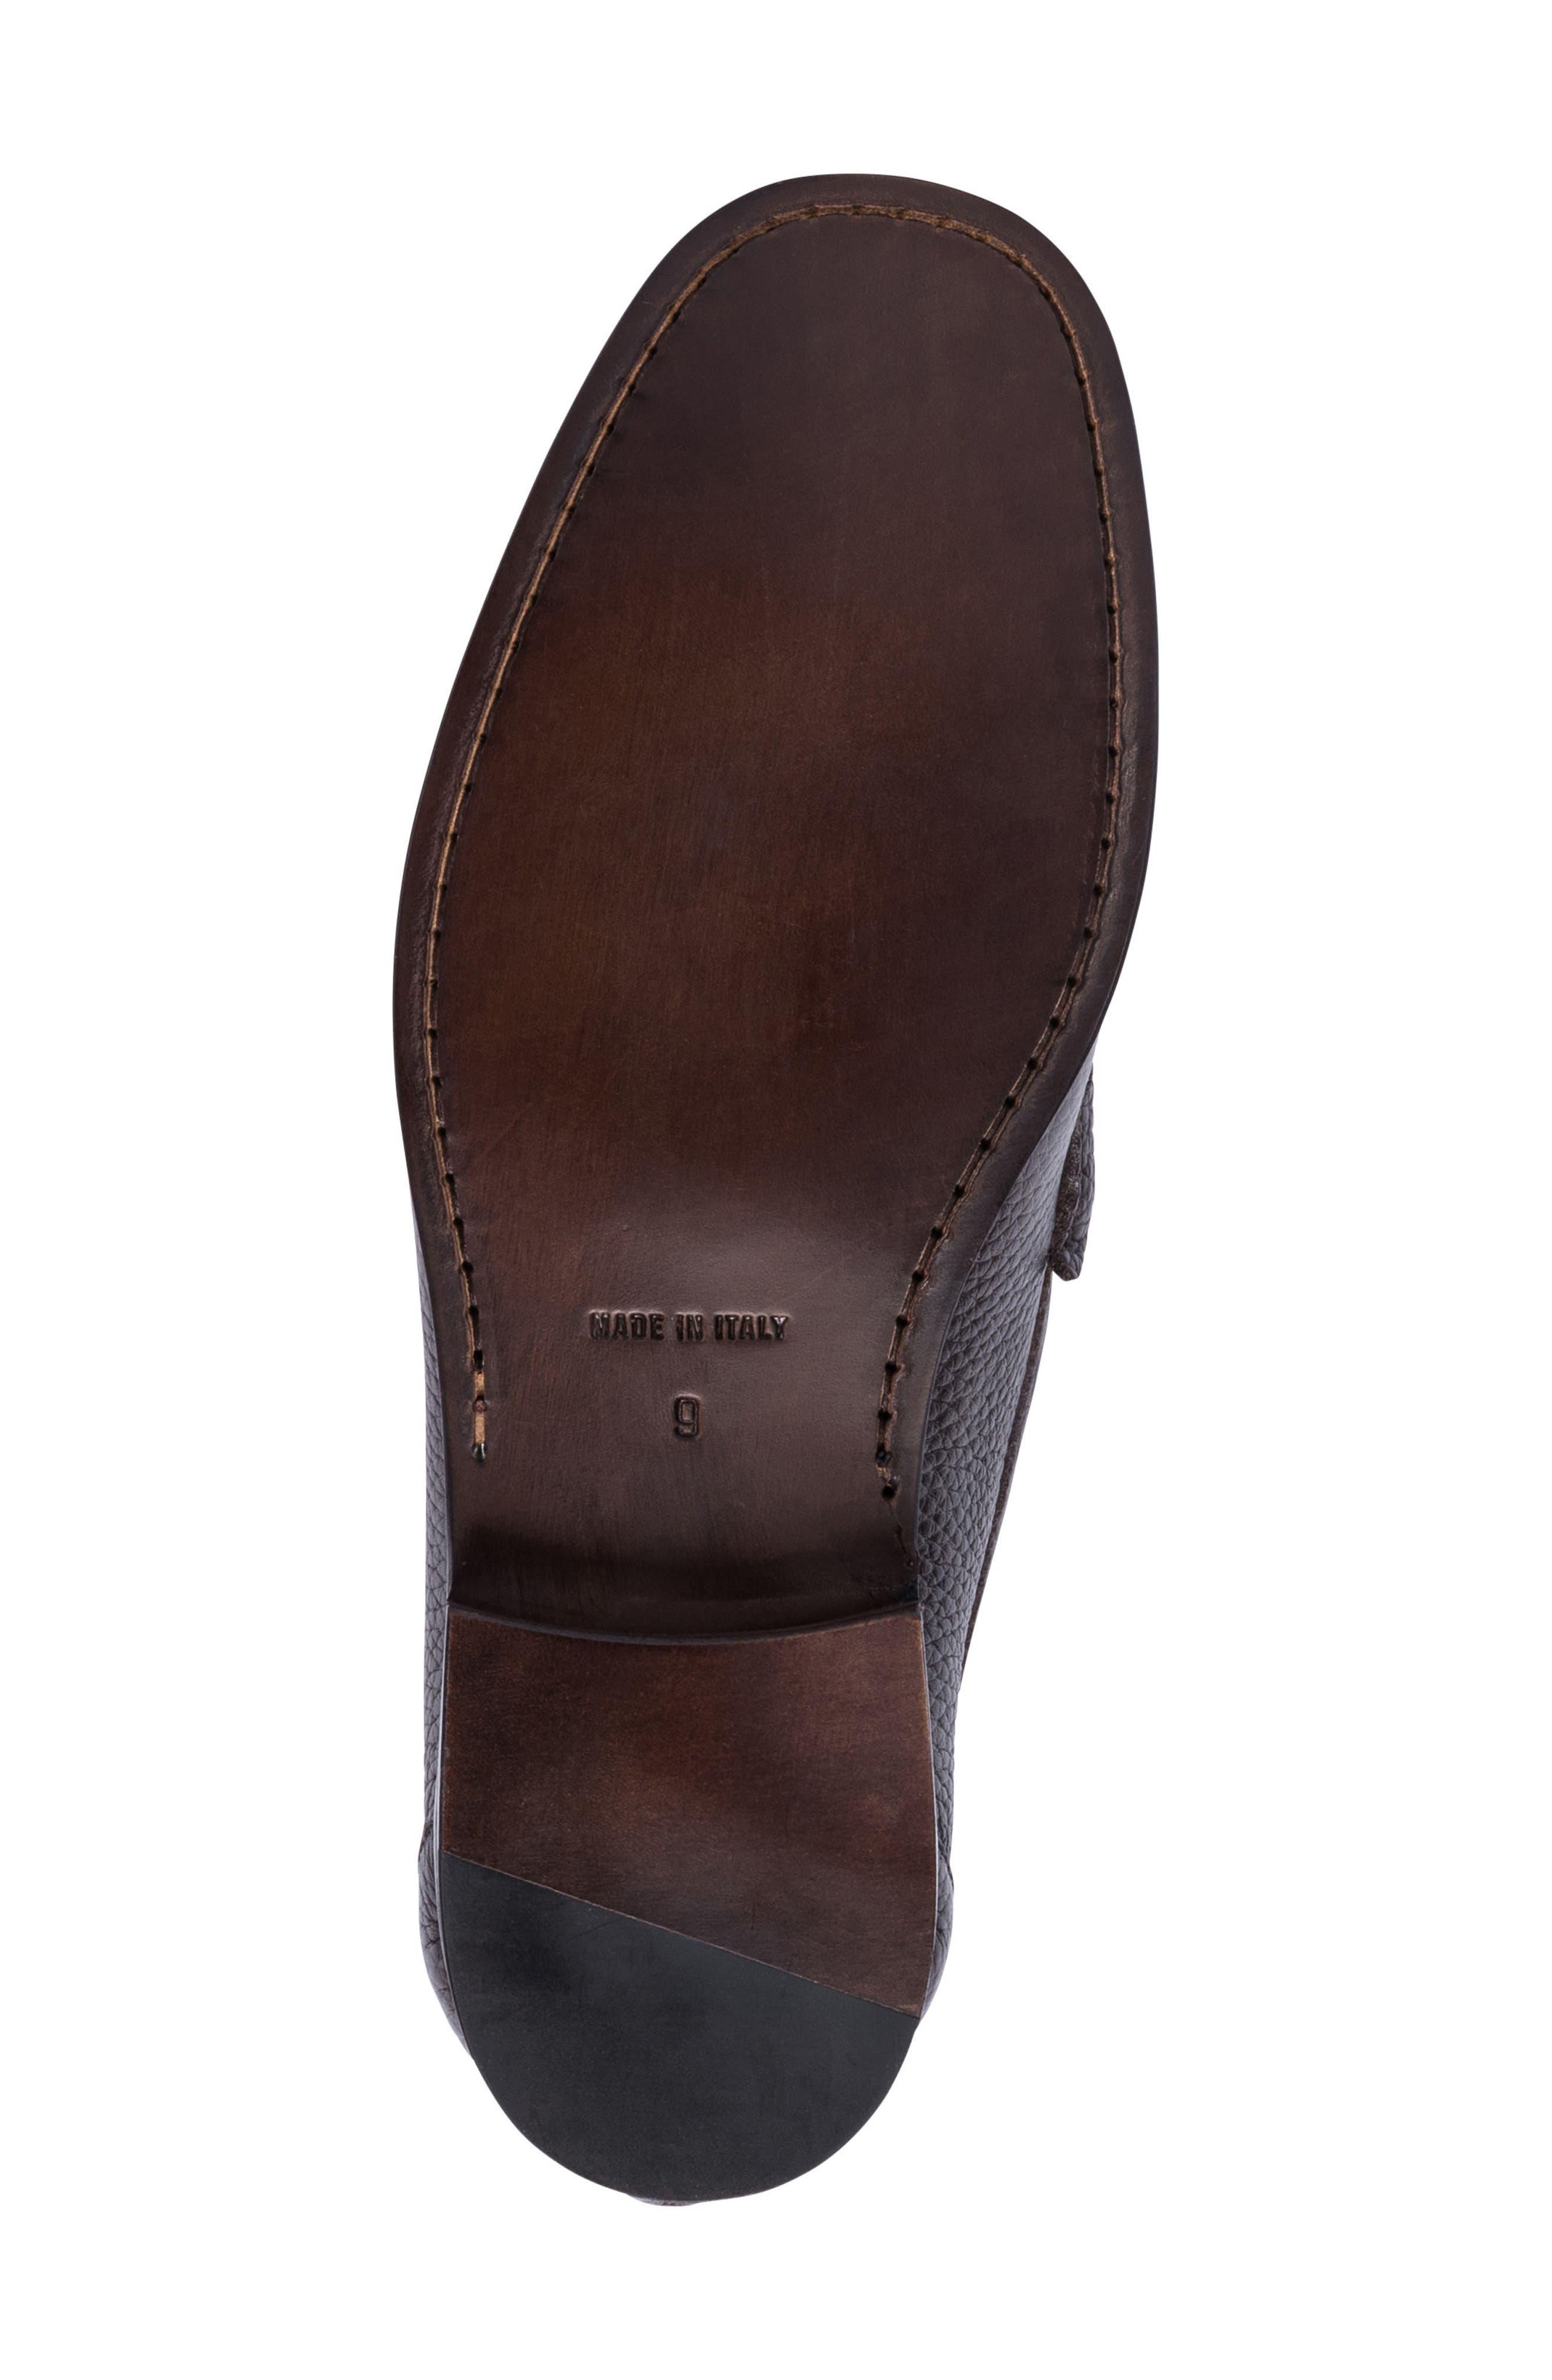 Padua Bit Loafer,                             Alternate thumbnail 6, color,                             Brown Leather